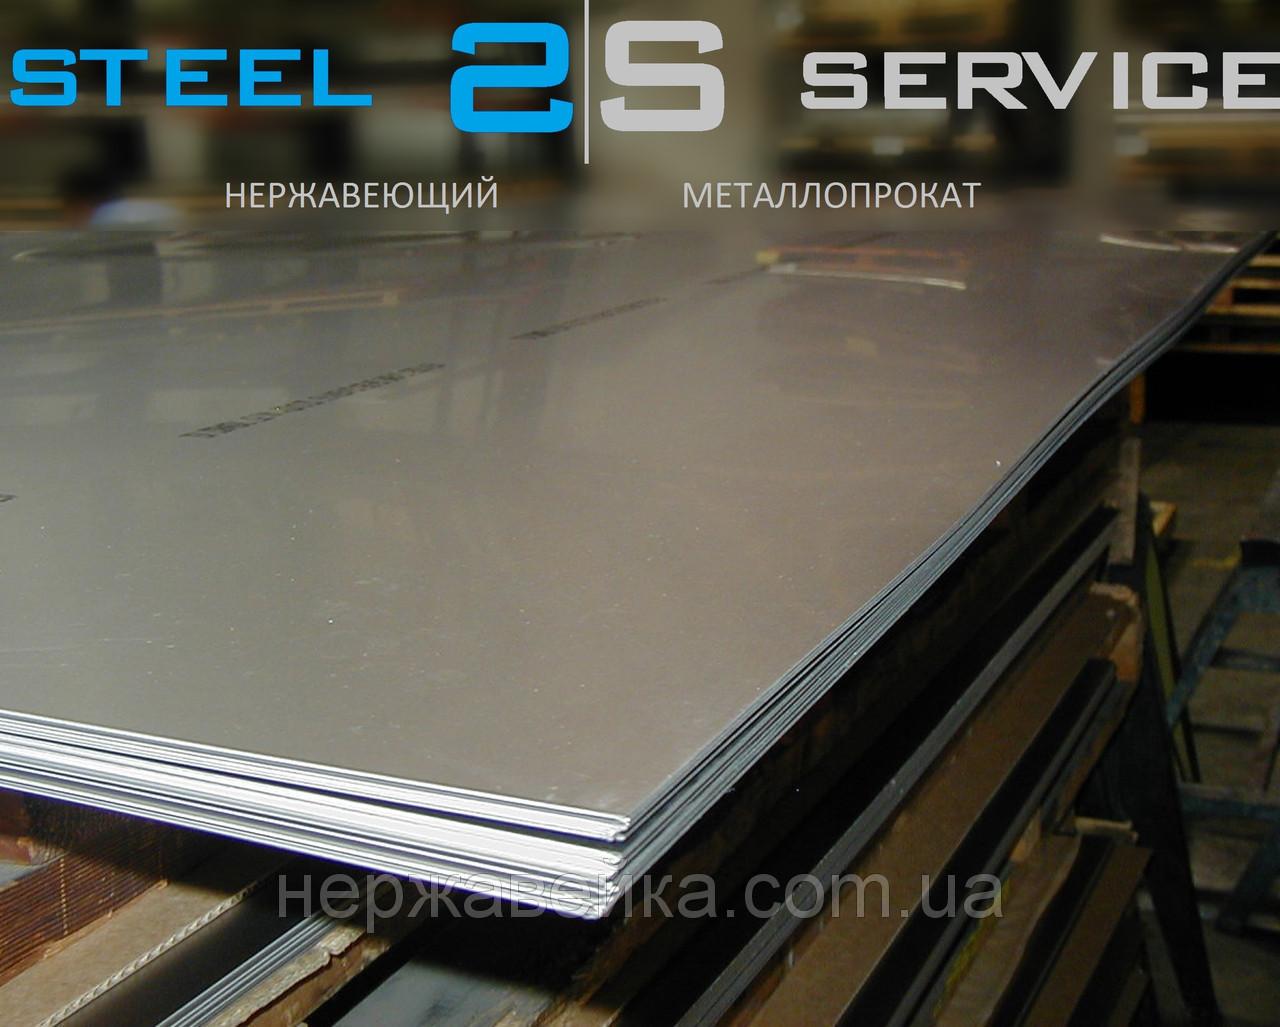 Нержавейка лист 16х1500х3000мм  AISI 316Ti(10Х17Н13М2Т) F1 - горячекатанный,  кислотостойкий